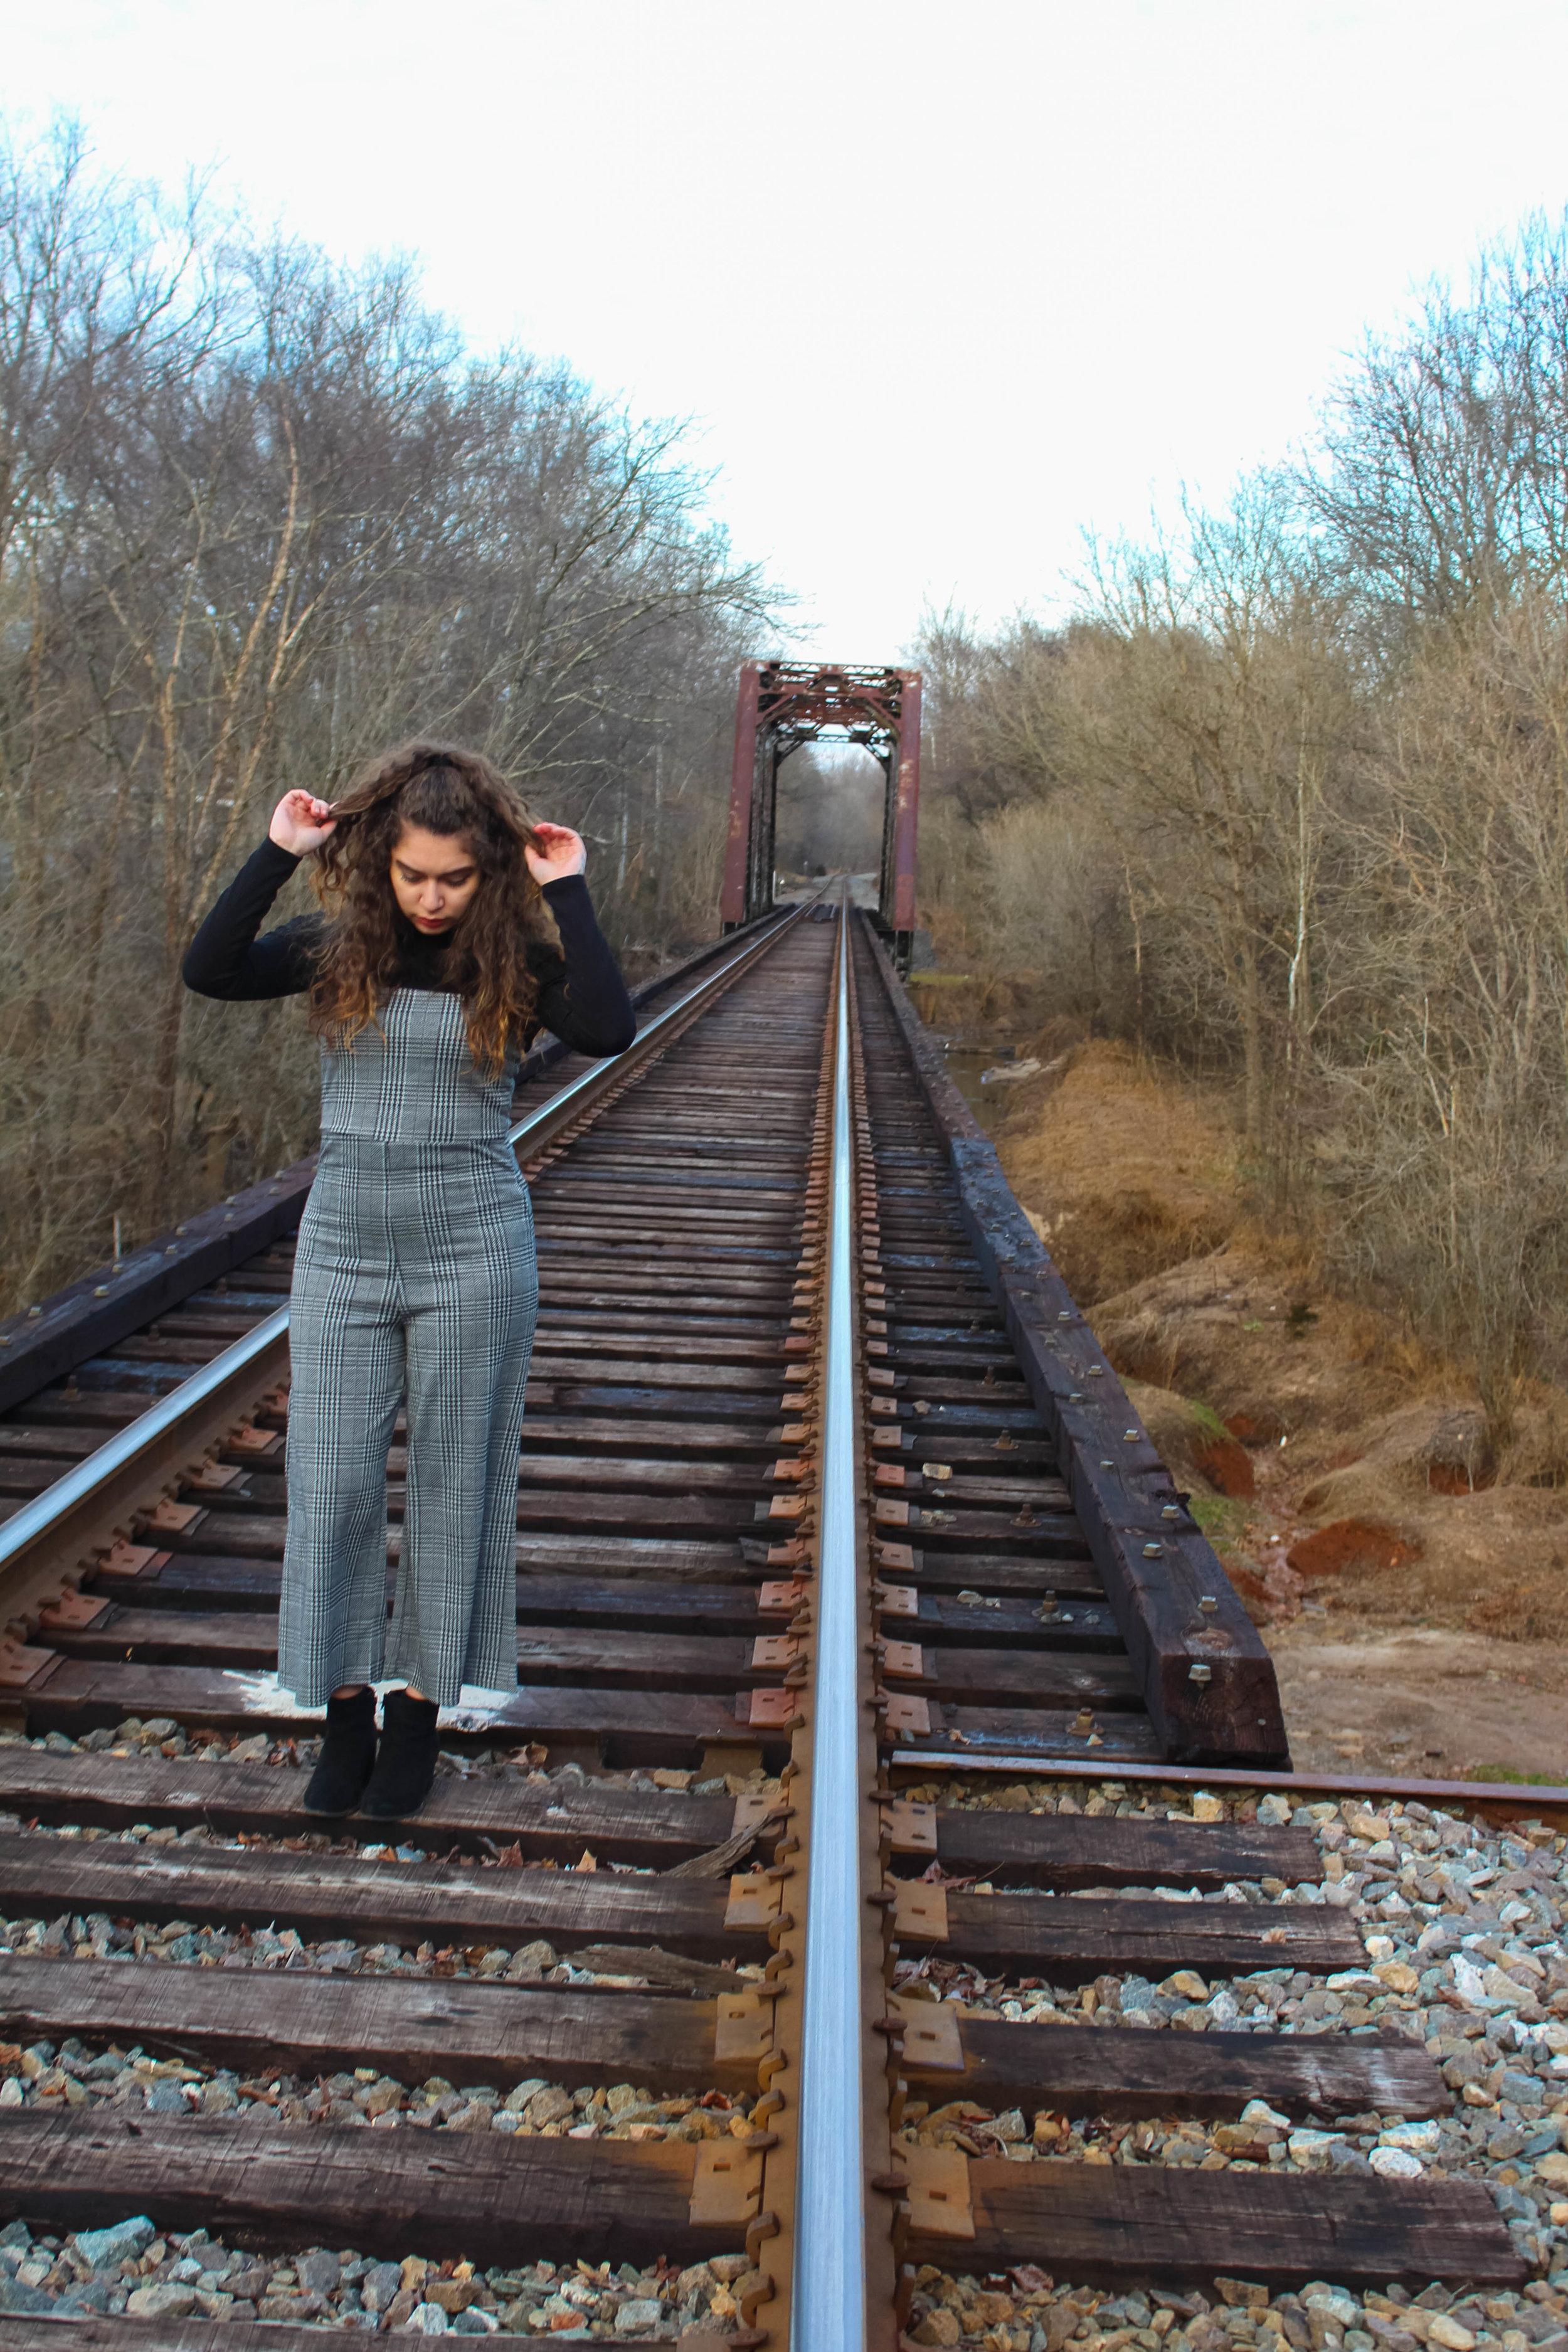 train tracks-edited-colorpop-3-1997.jpg